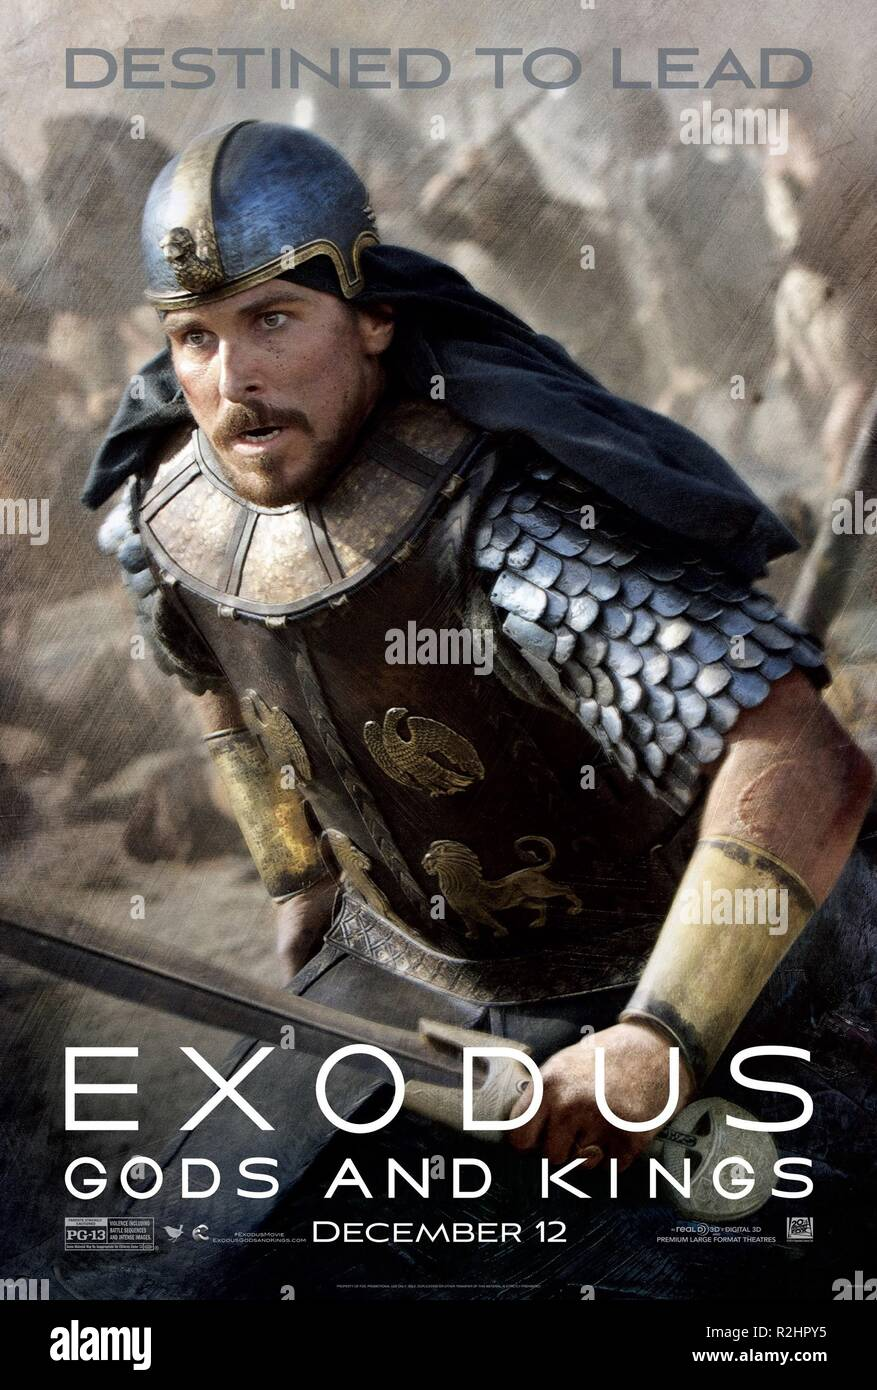 Exodus: Gods and Kings Year: 2014 USA / UK Director : Ridley Scott Christian Bale Movie poster (USA) - Stock Image